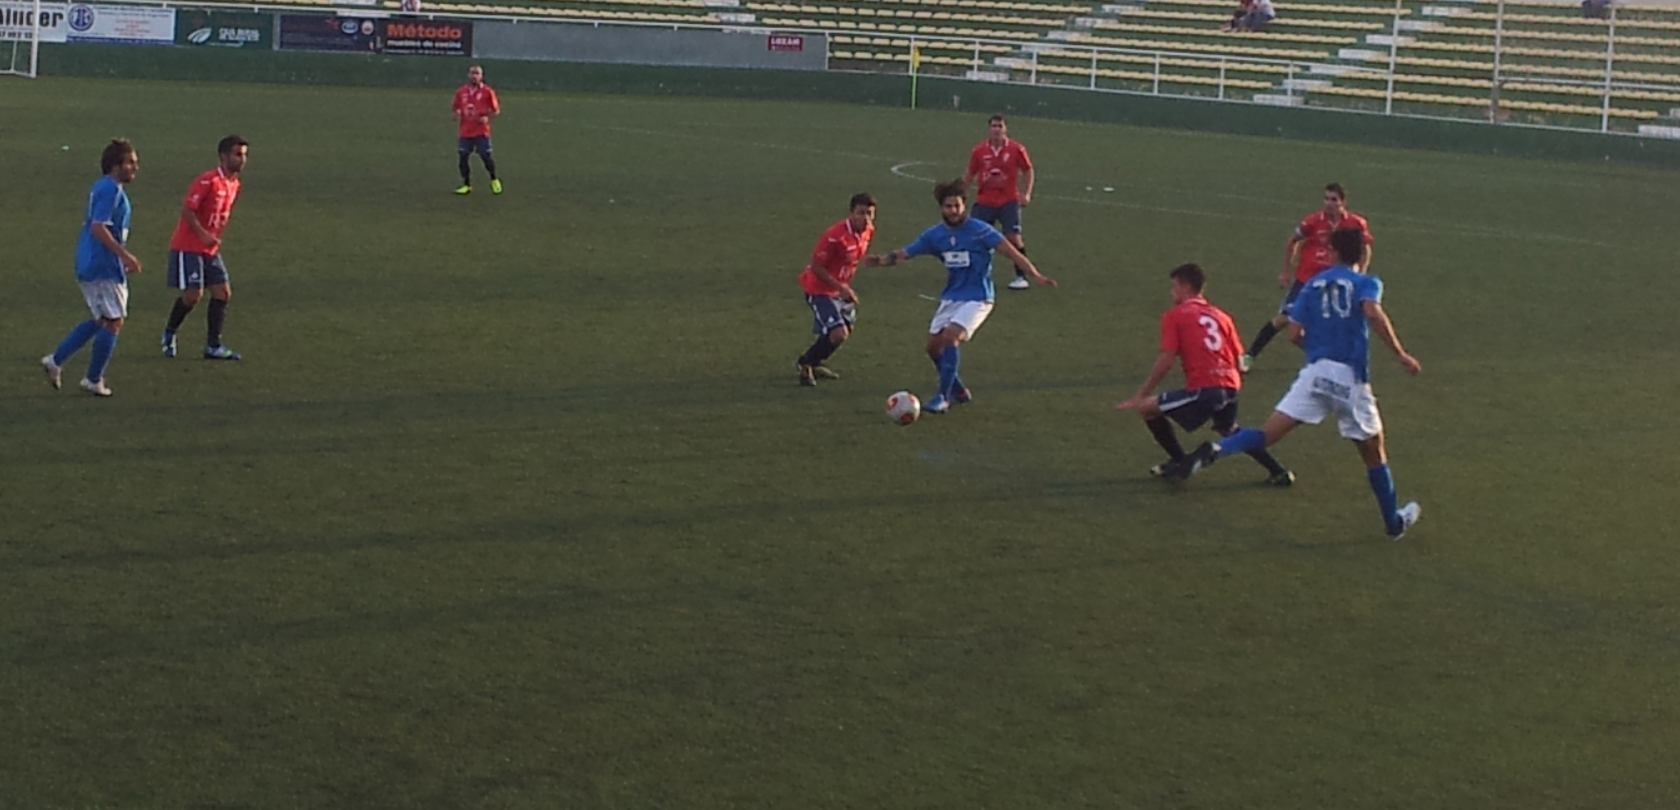 CF Zona 5 - CP Villarrobledo